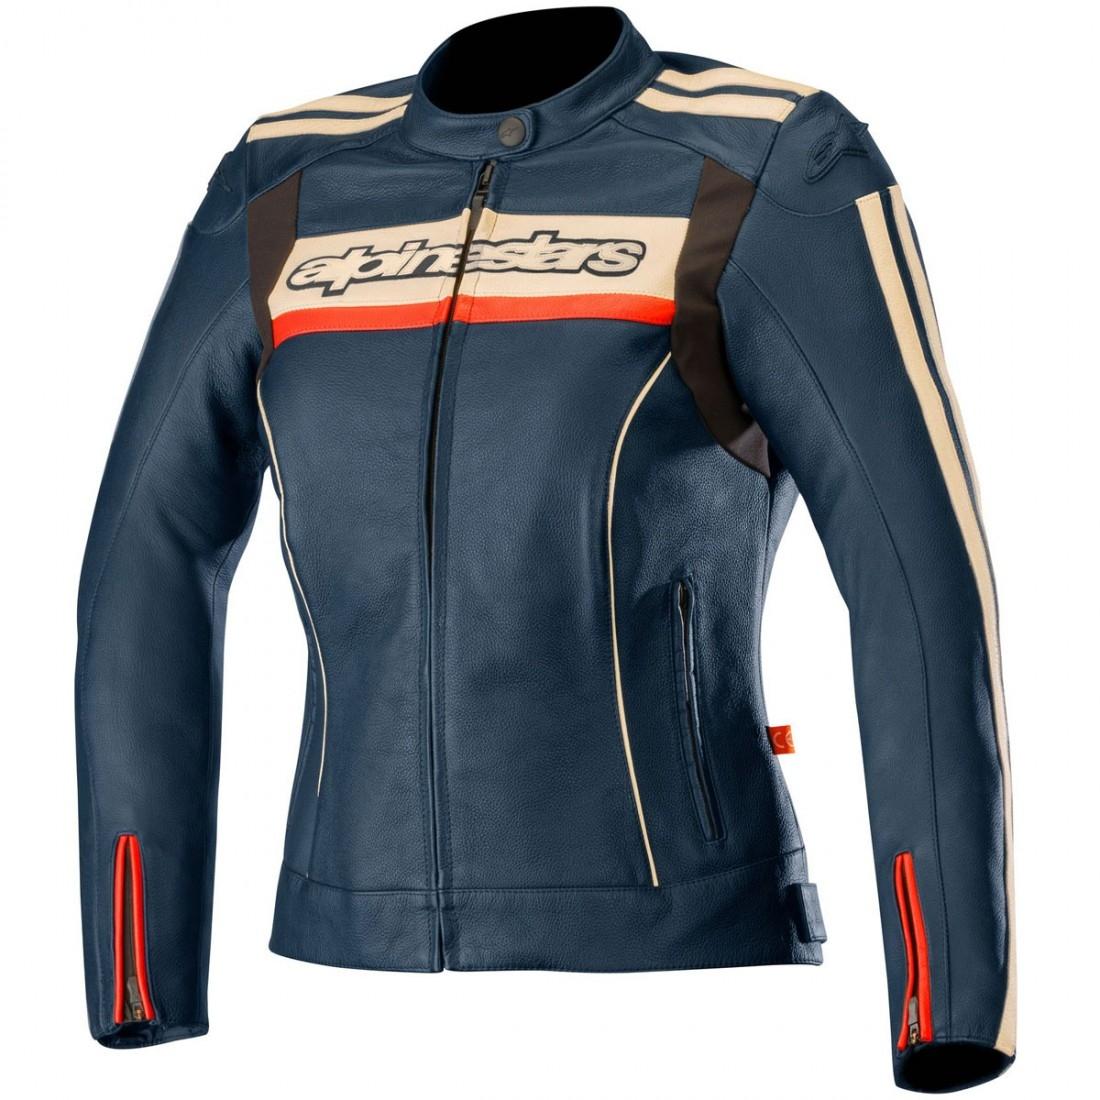 Alpinestars dyno leather jacket